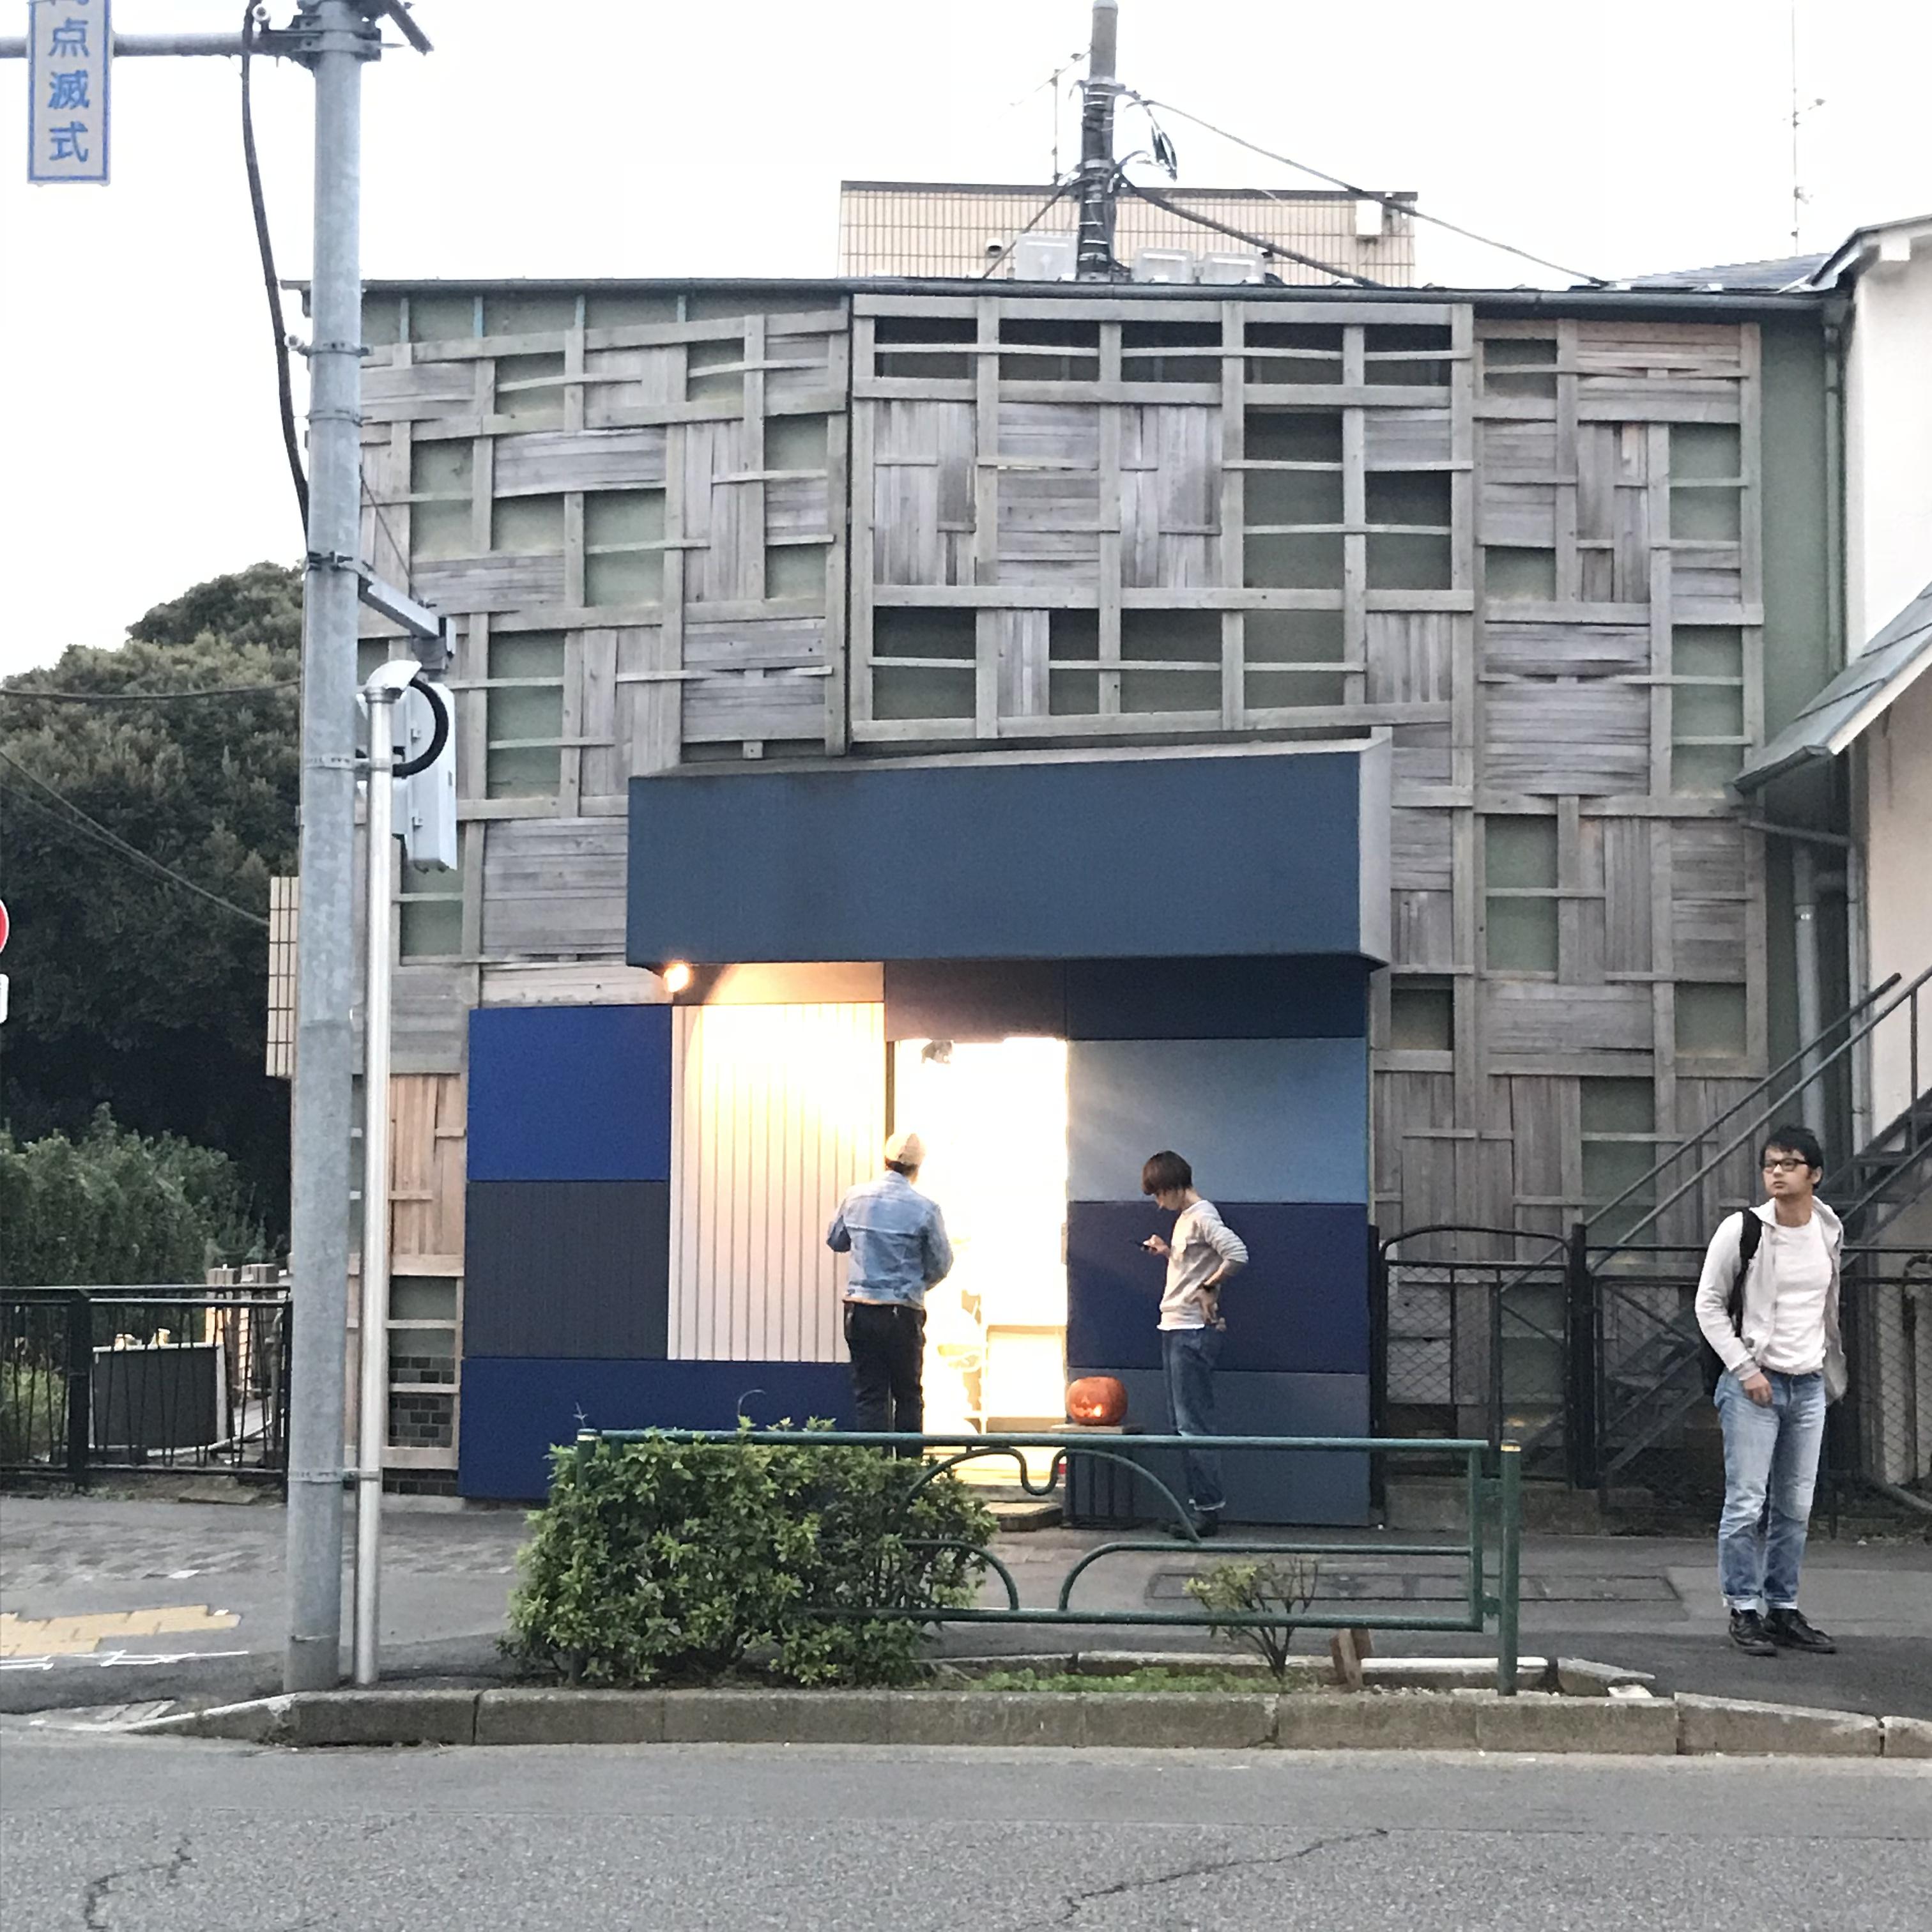 Hobonichi store, Tobichi, Omotesando, Tokyo, Japan